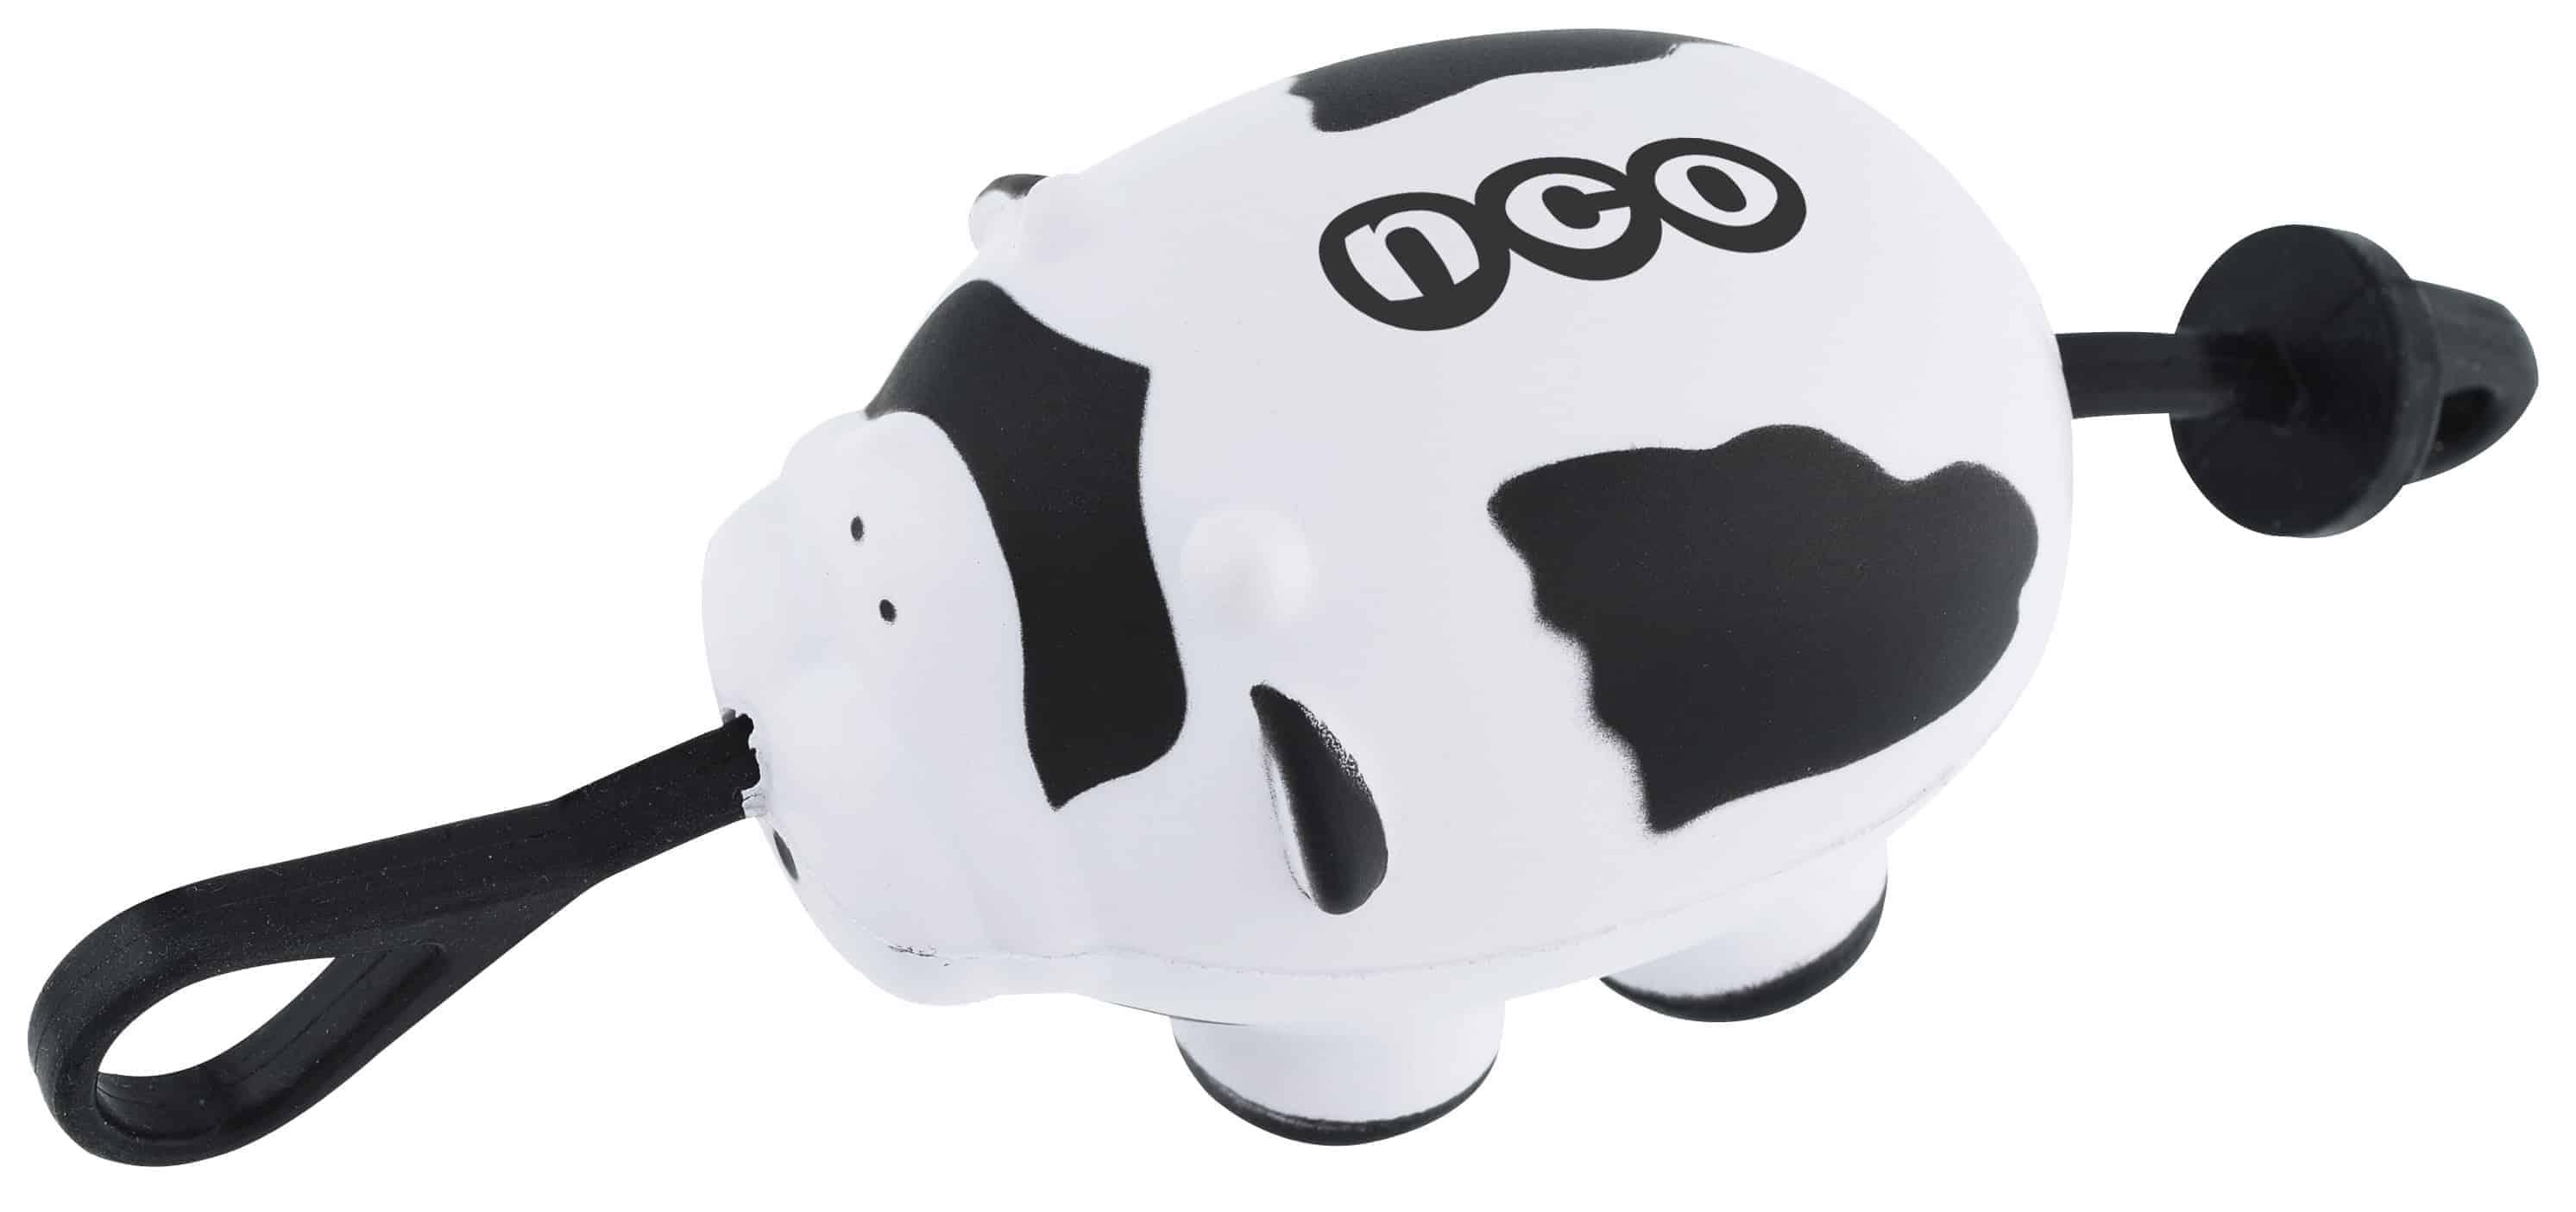 A black and white Slingshot Foam Cow.